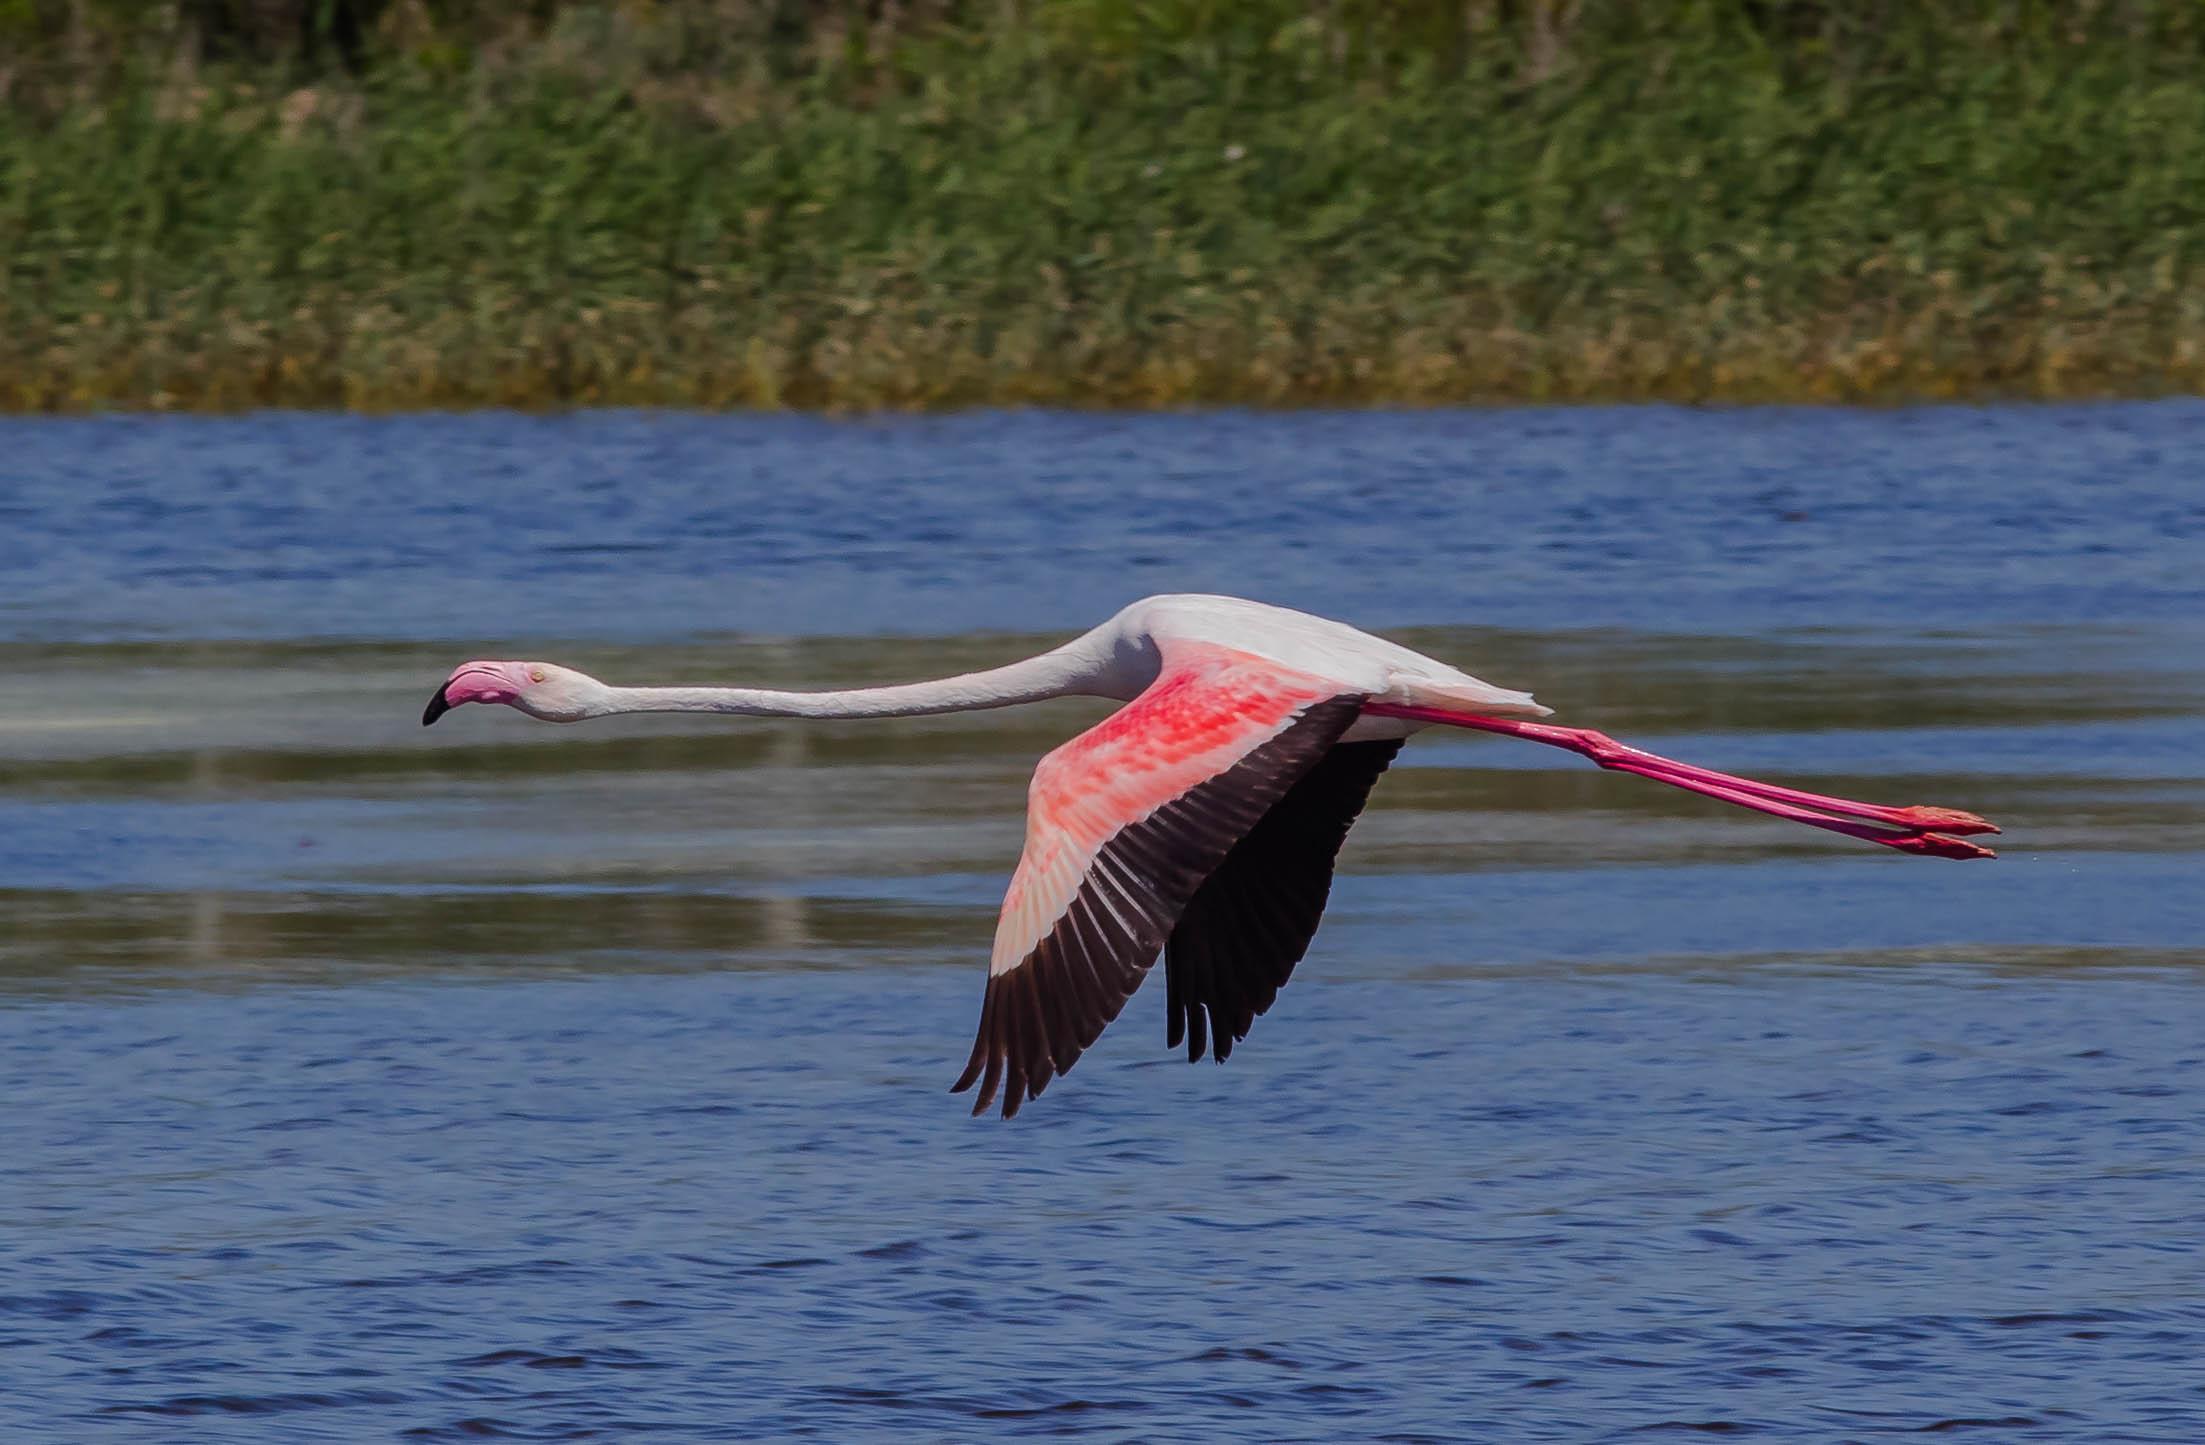 The Flamingos flight...